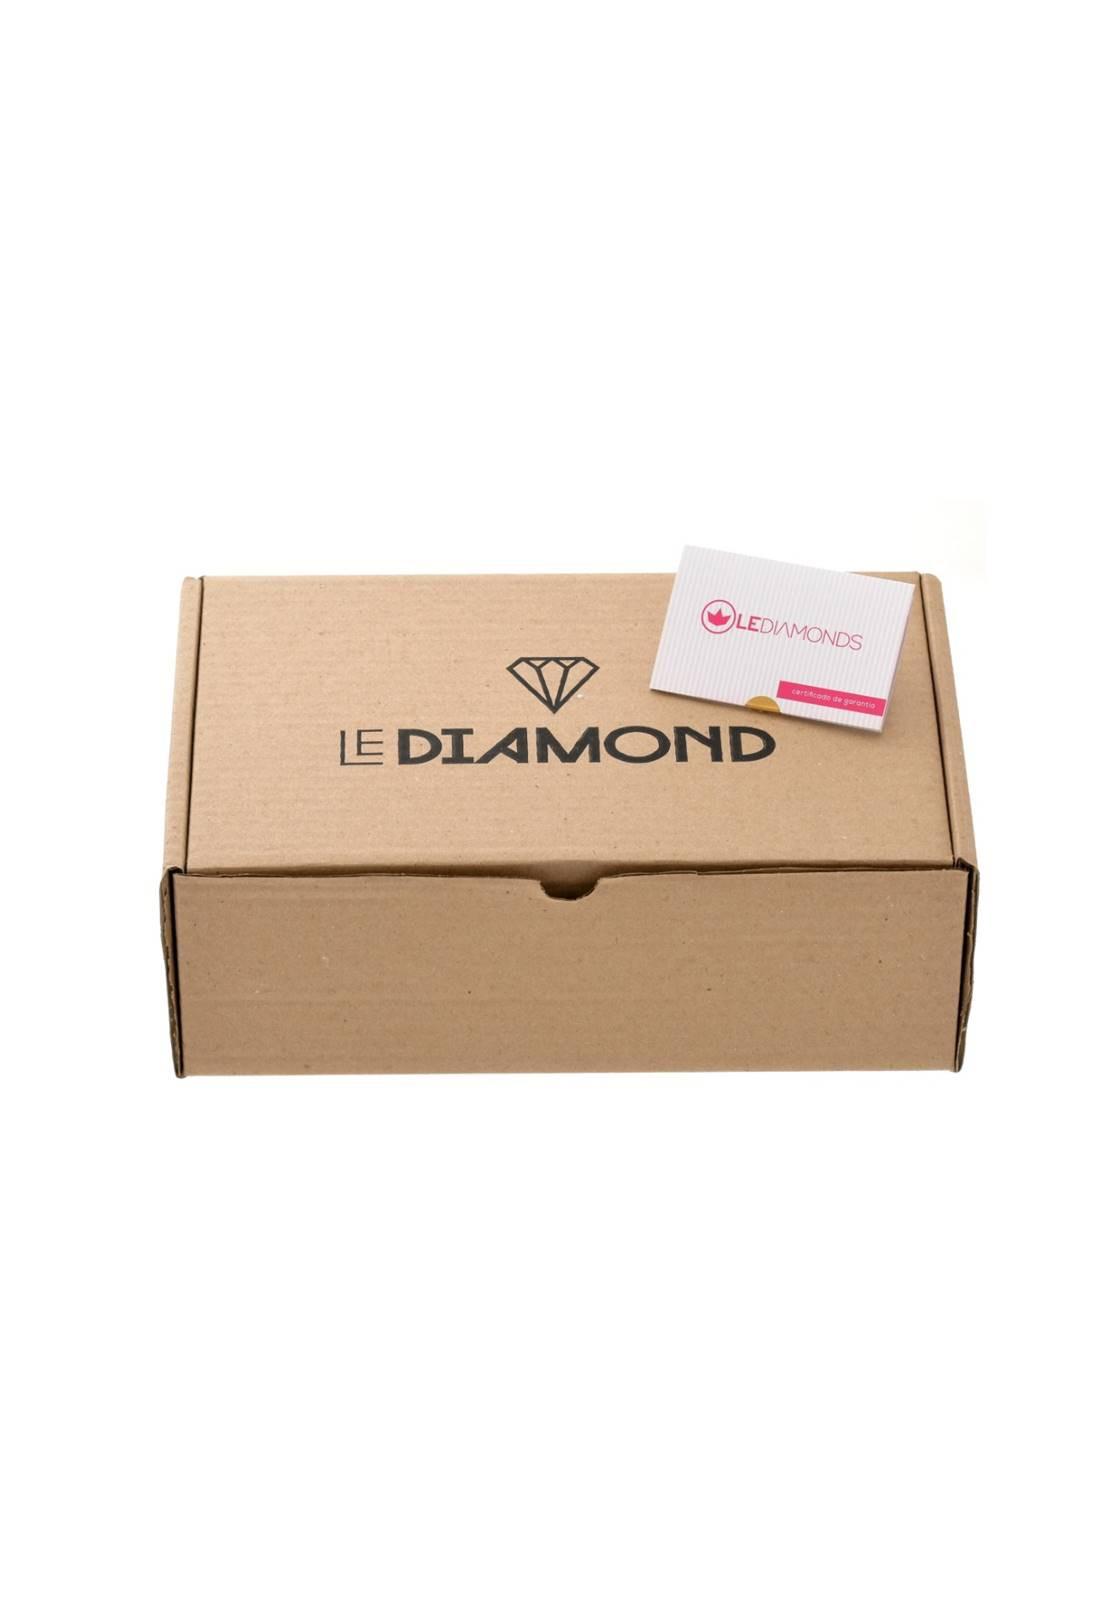 Tornozeleira Le Diamond Silicone Tubinho Dourado